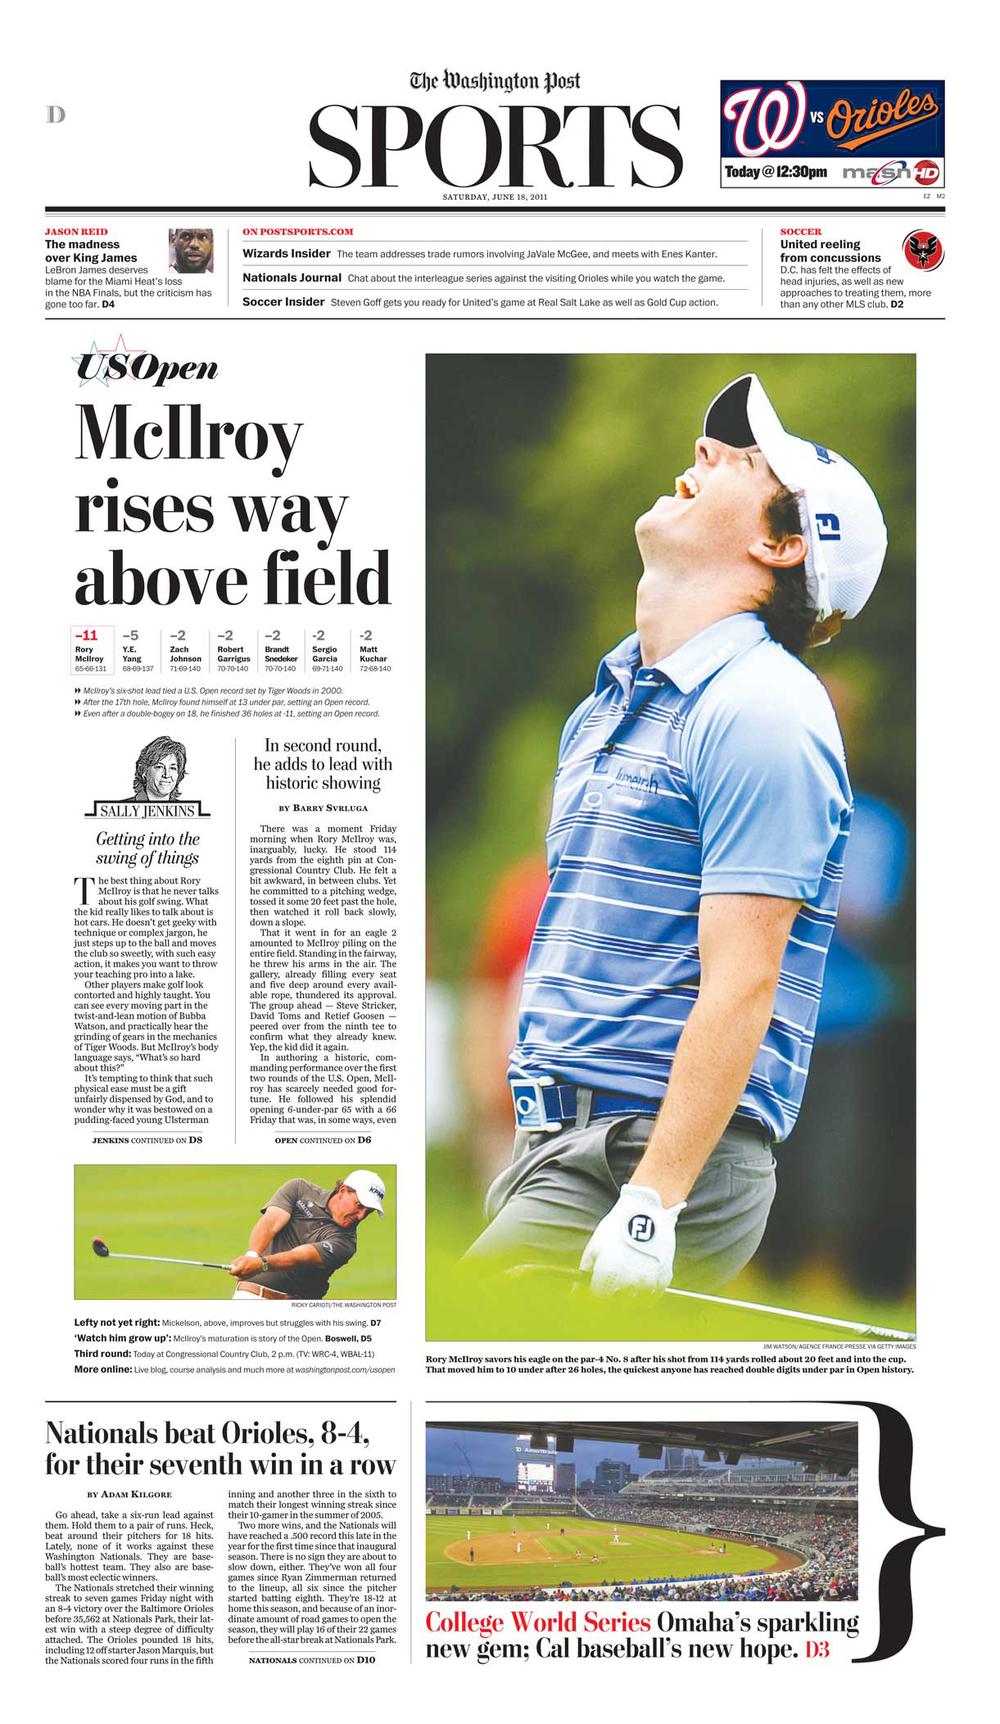 US Open: McIlroy Rises